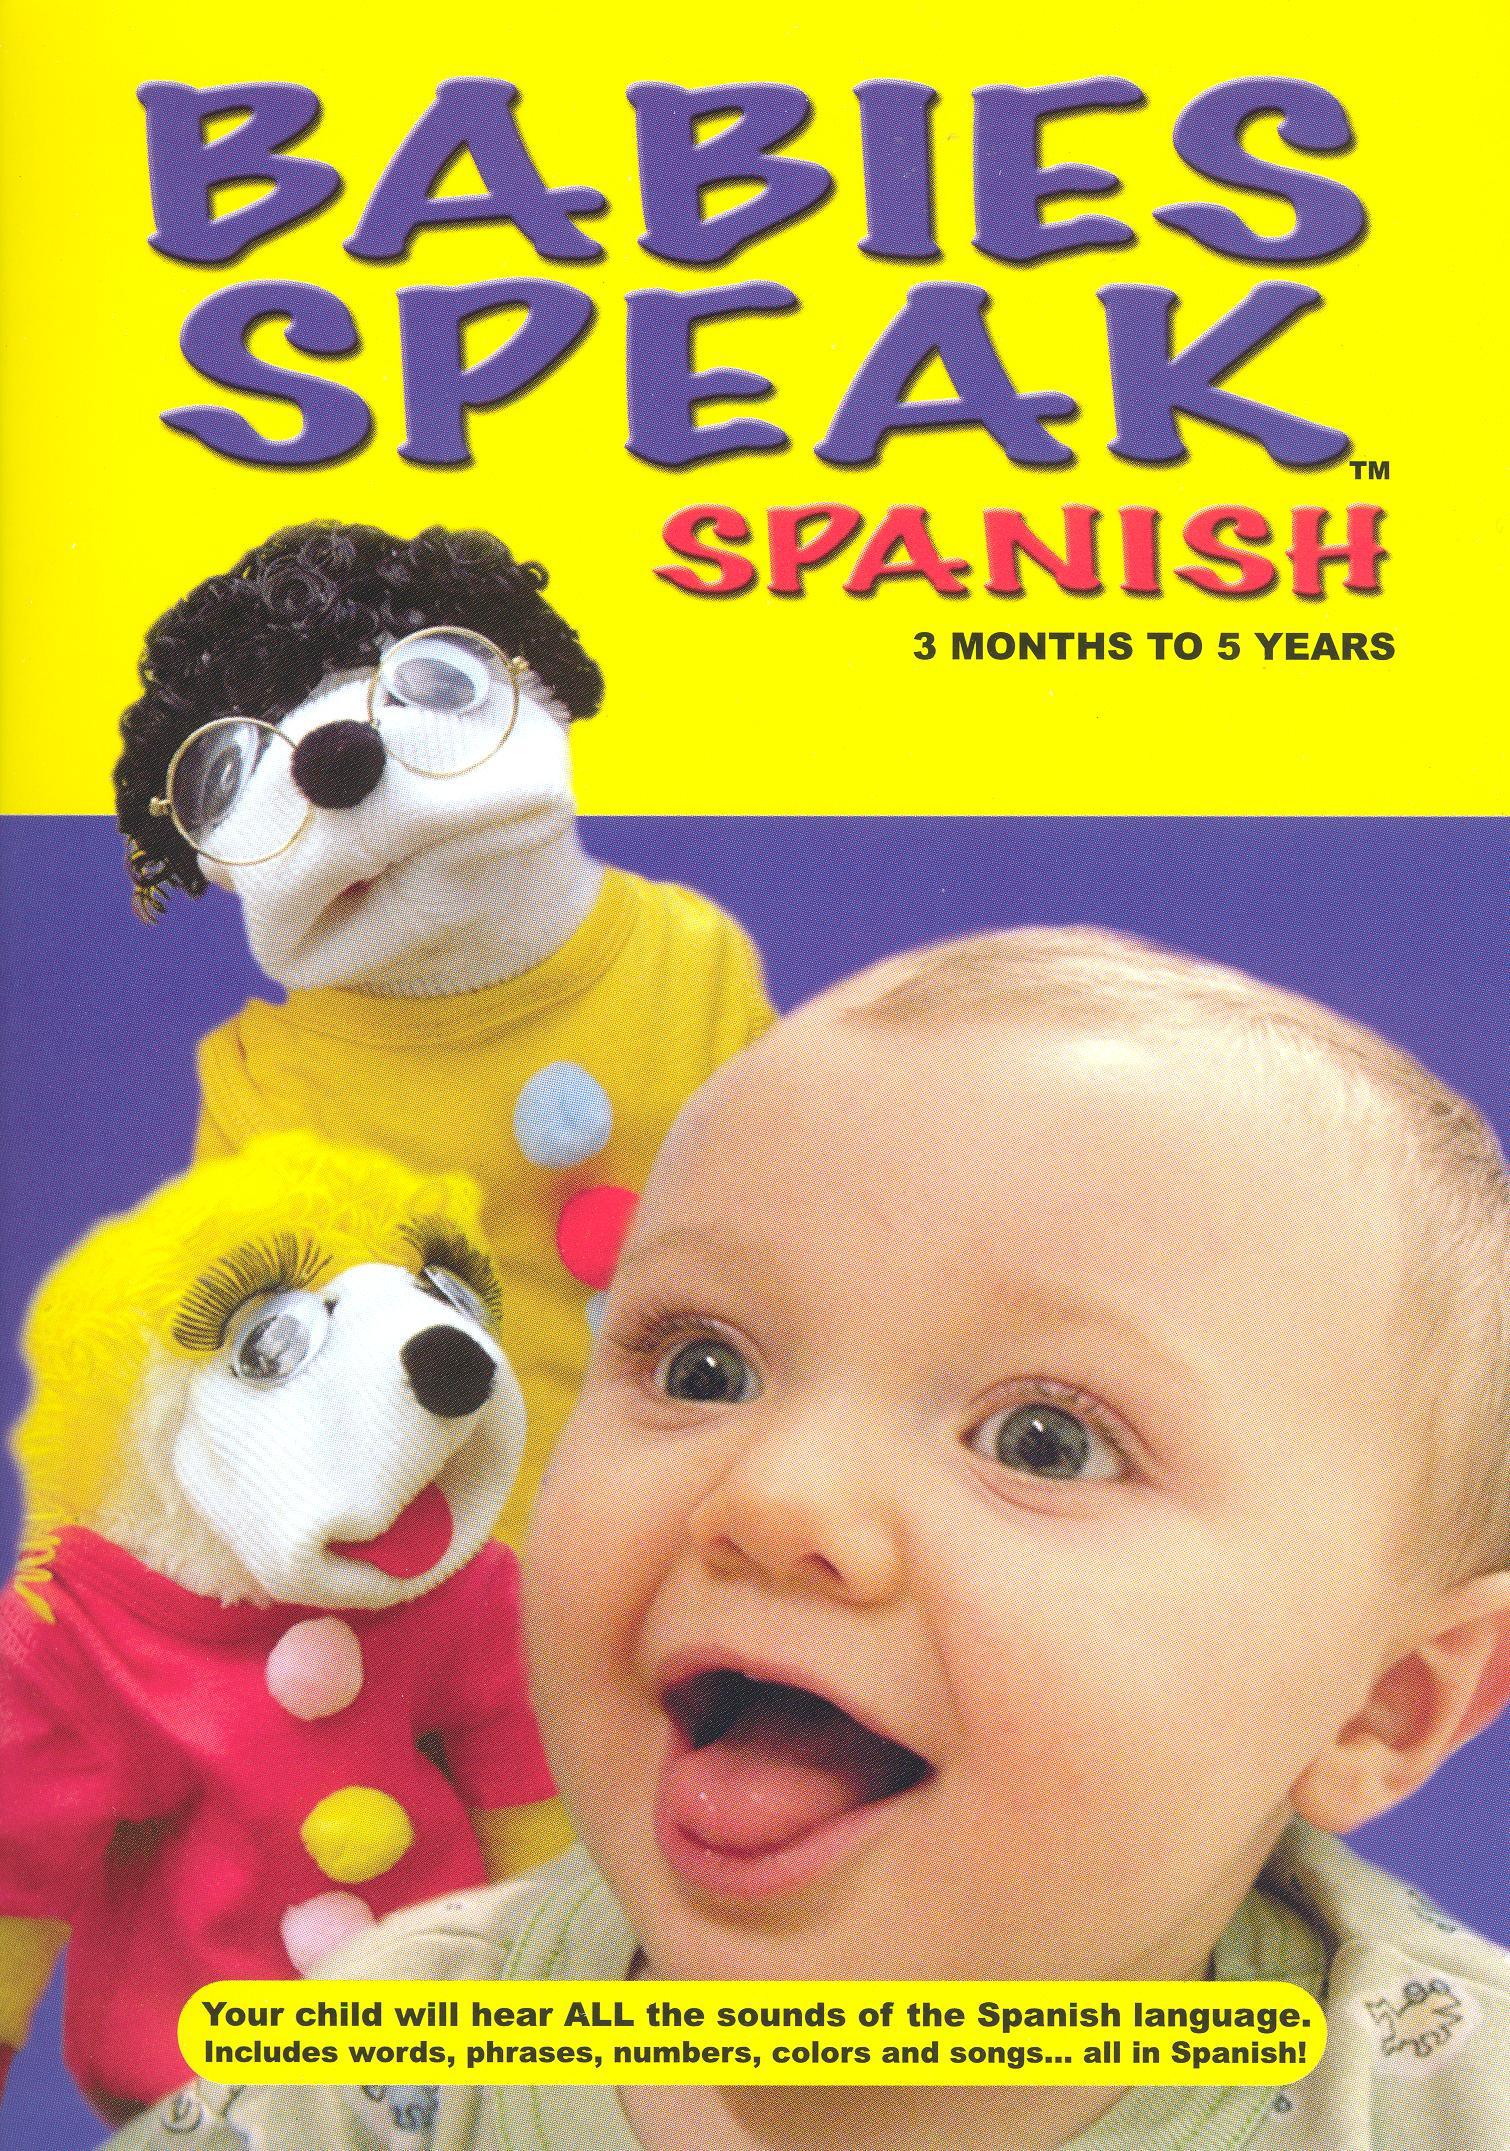 Babies Speak Spanish